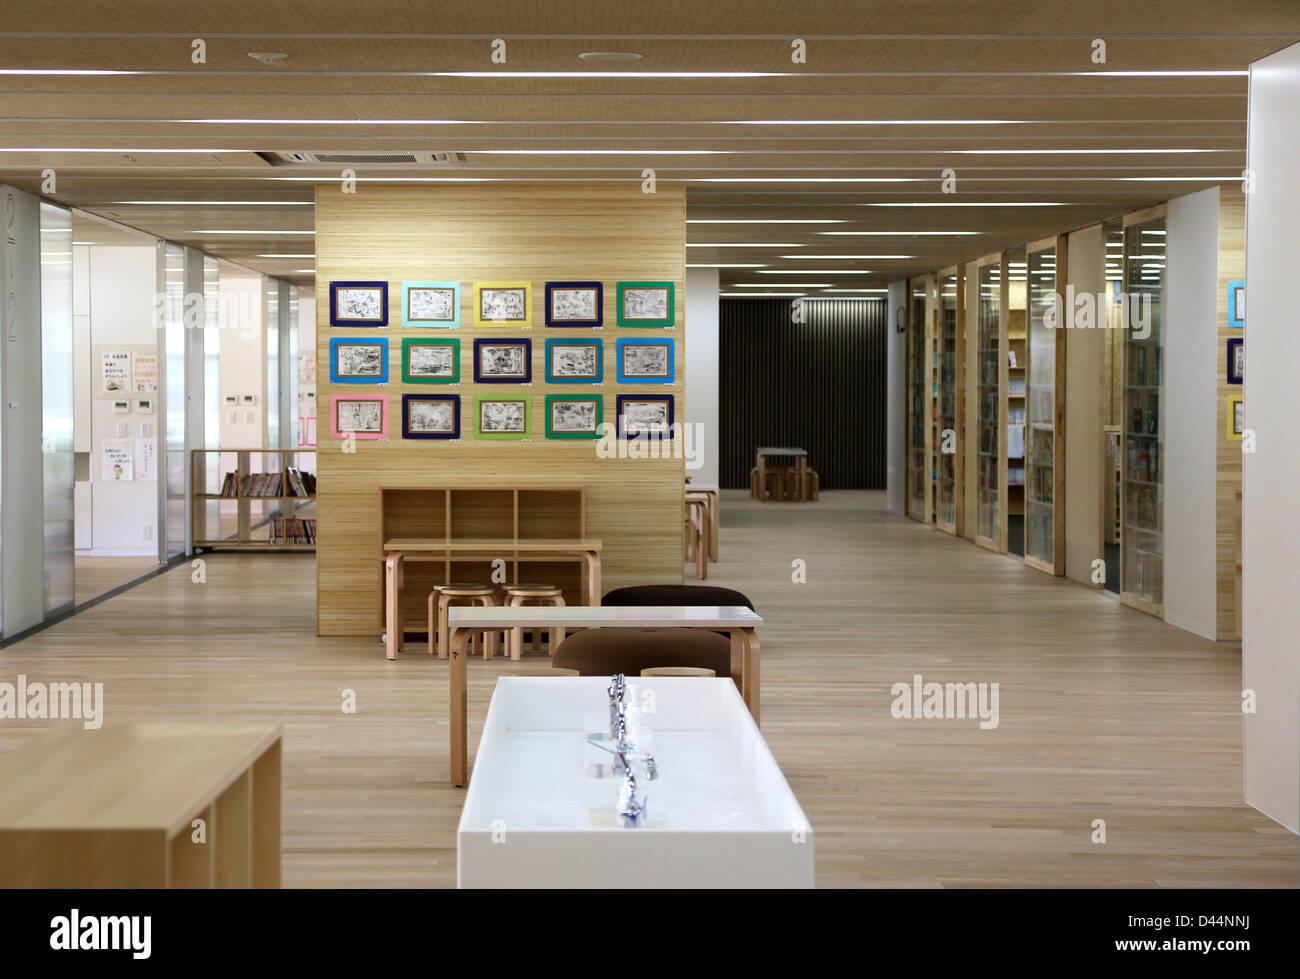 Teikyo University Elementary School Tokyo Japan Architect Kengo Kuma 2012 Interior View Main Corridor On Ground Floor